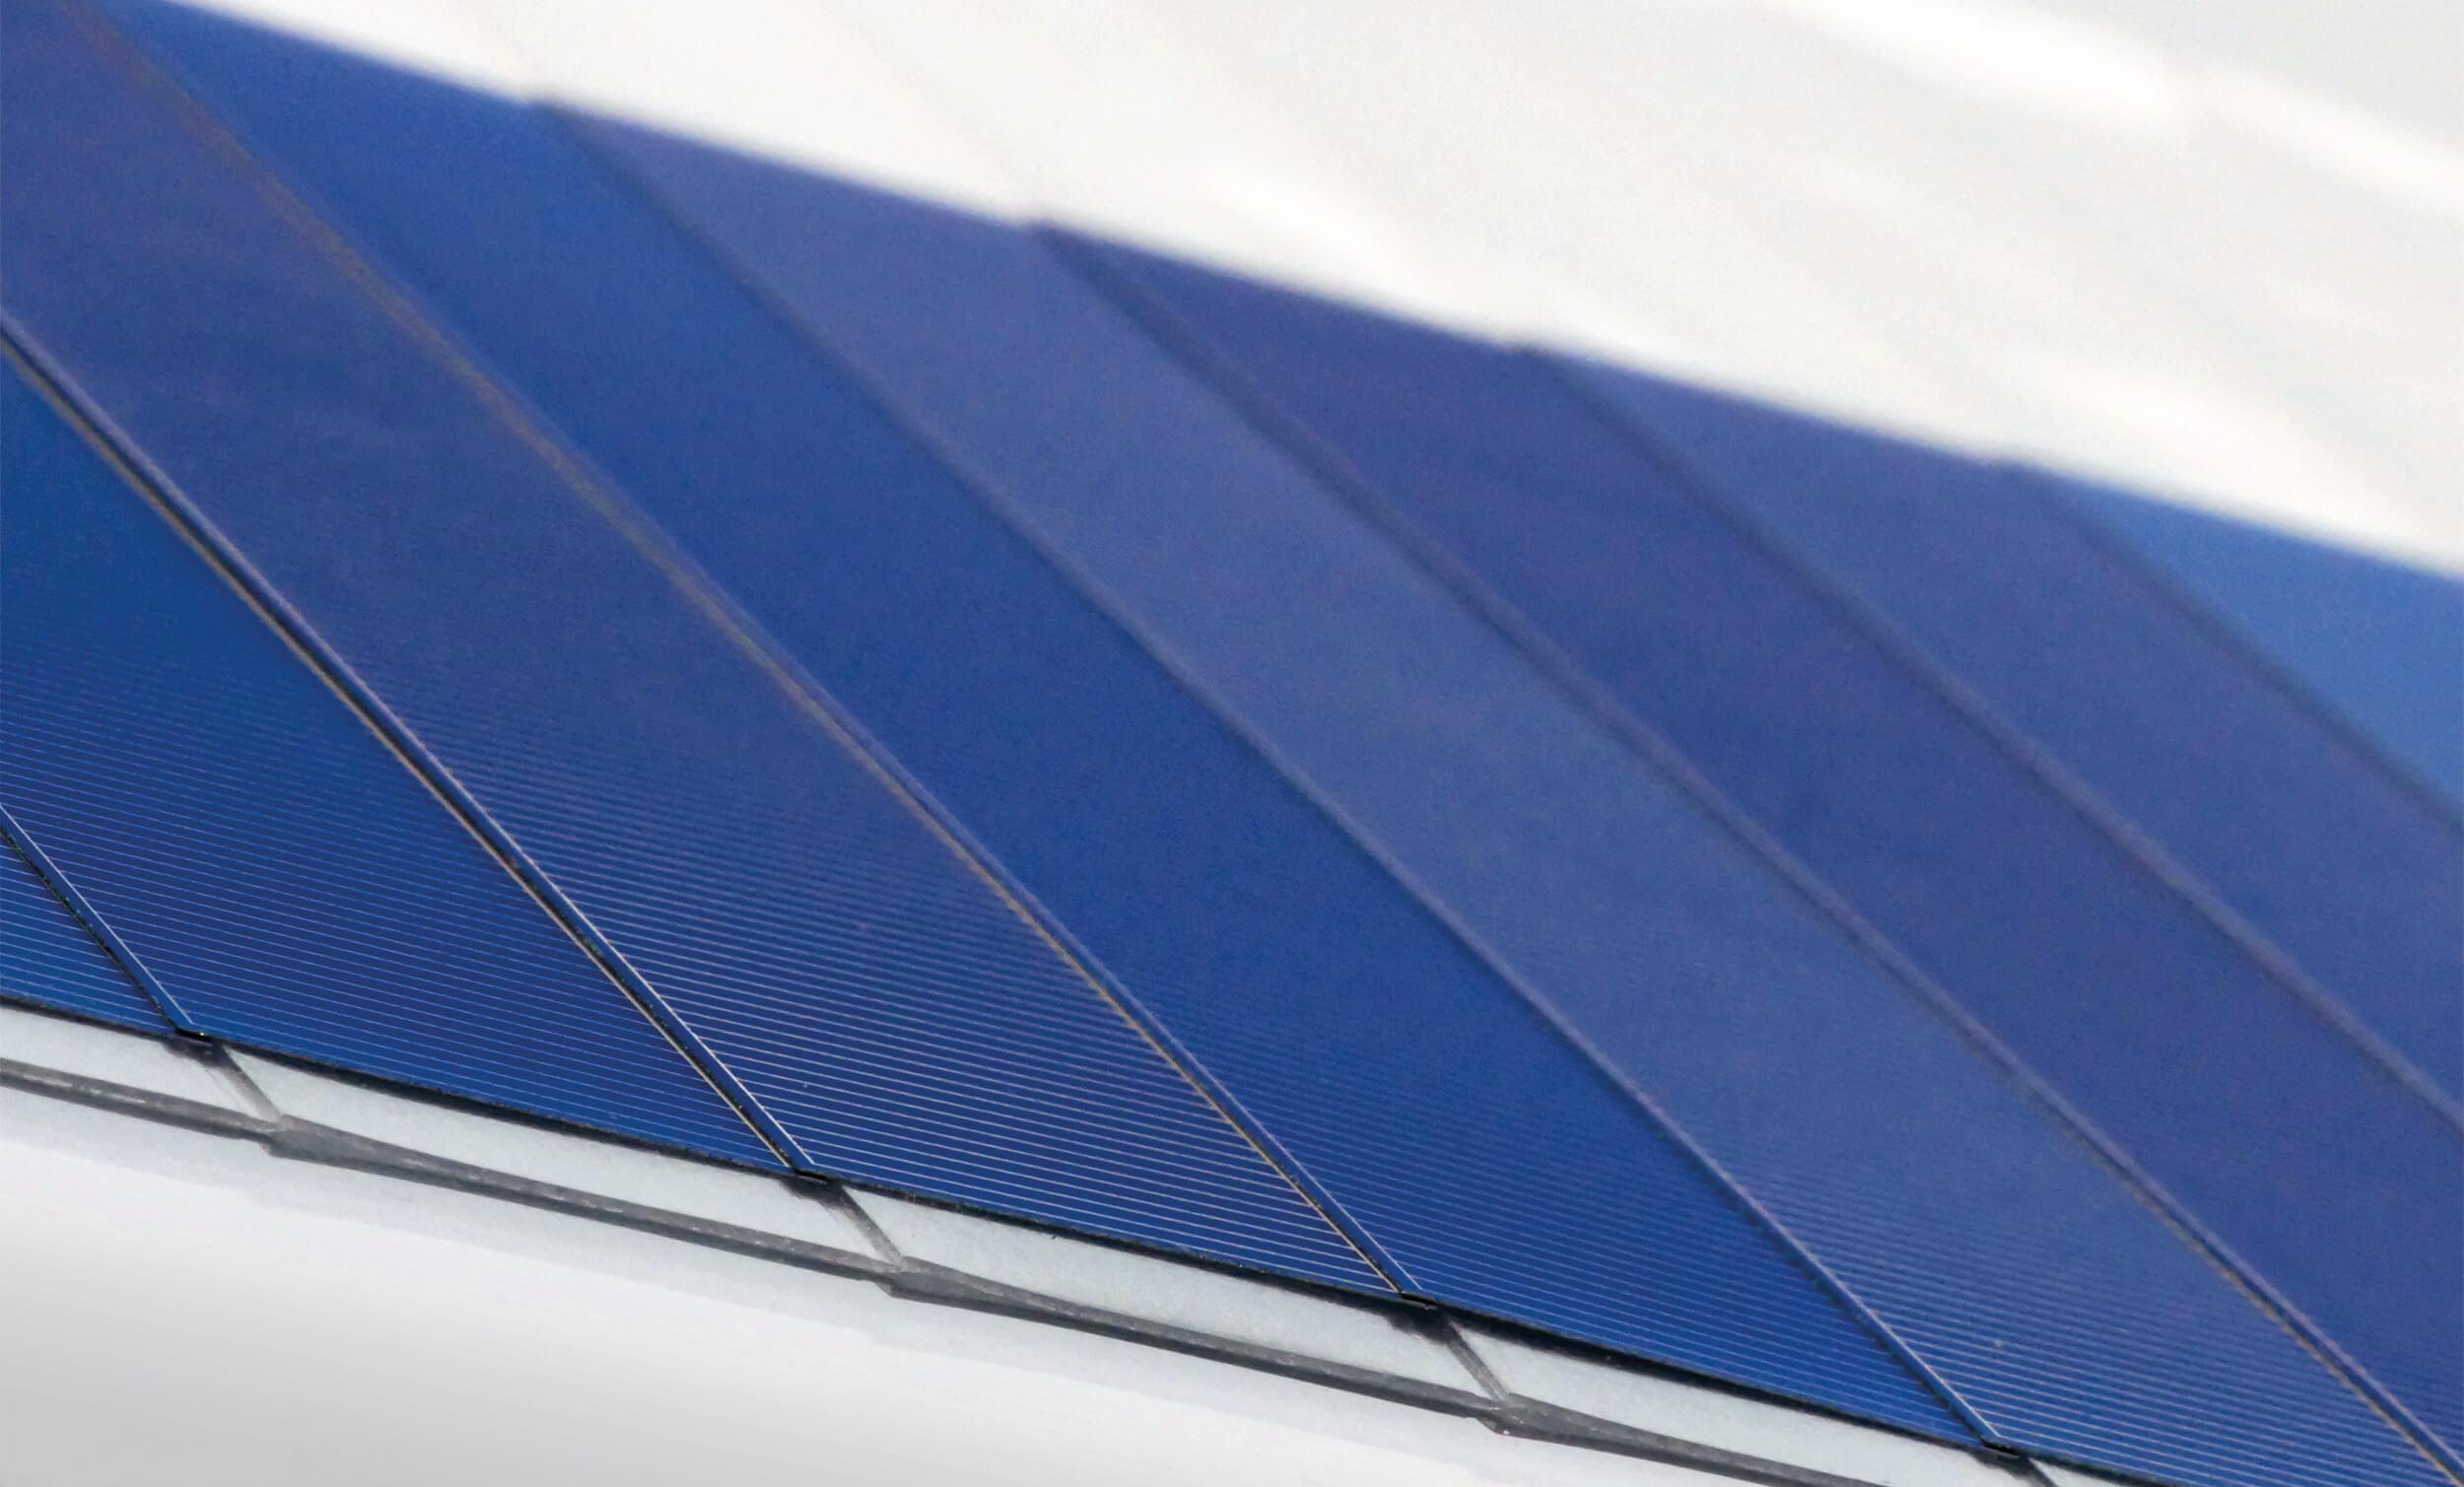 Fraunhofer ISE Showcases Shingle Solar Cells, Integrated